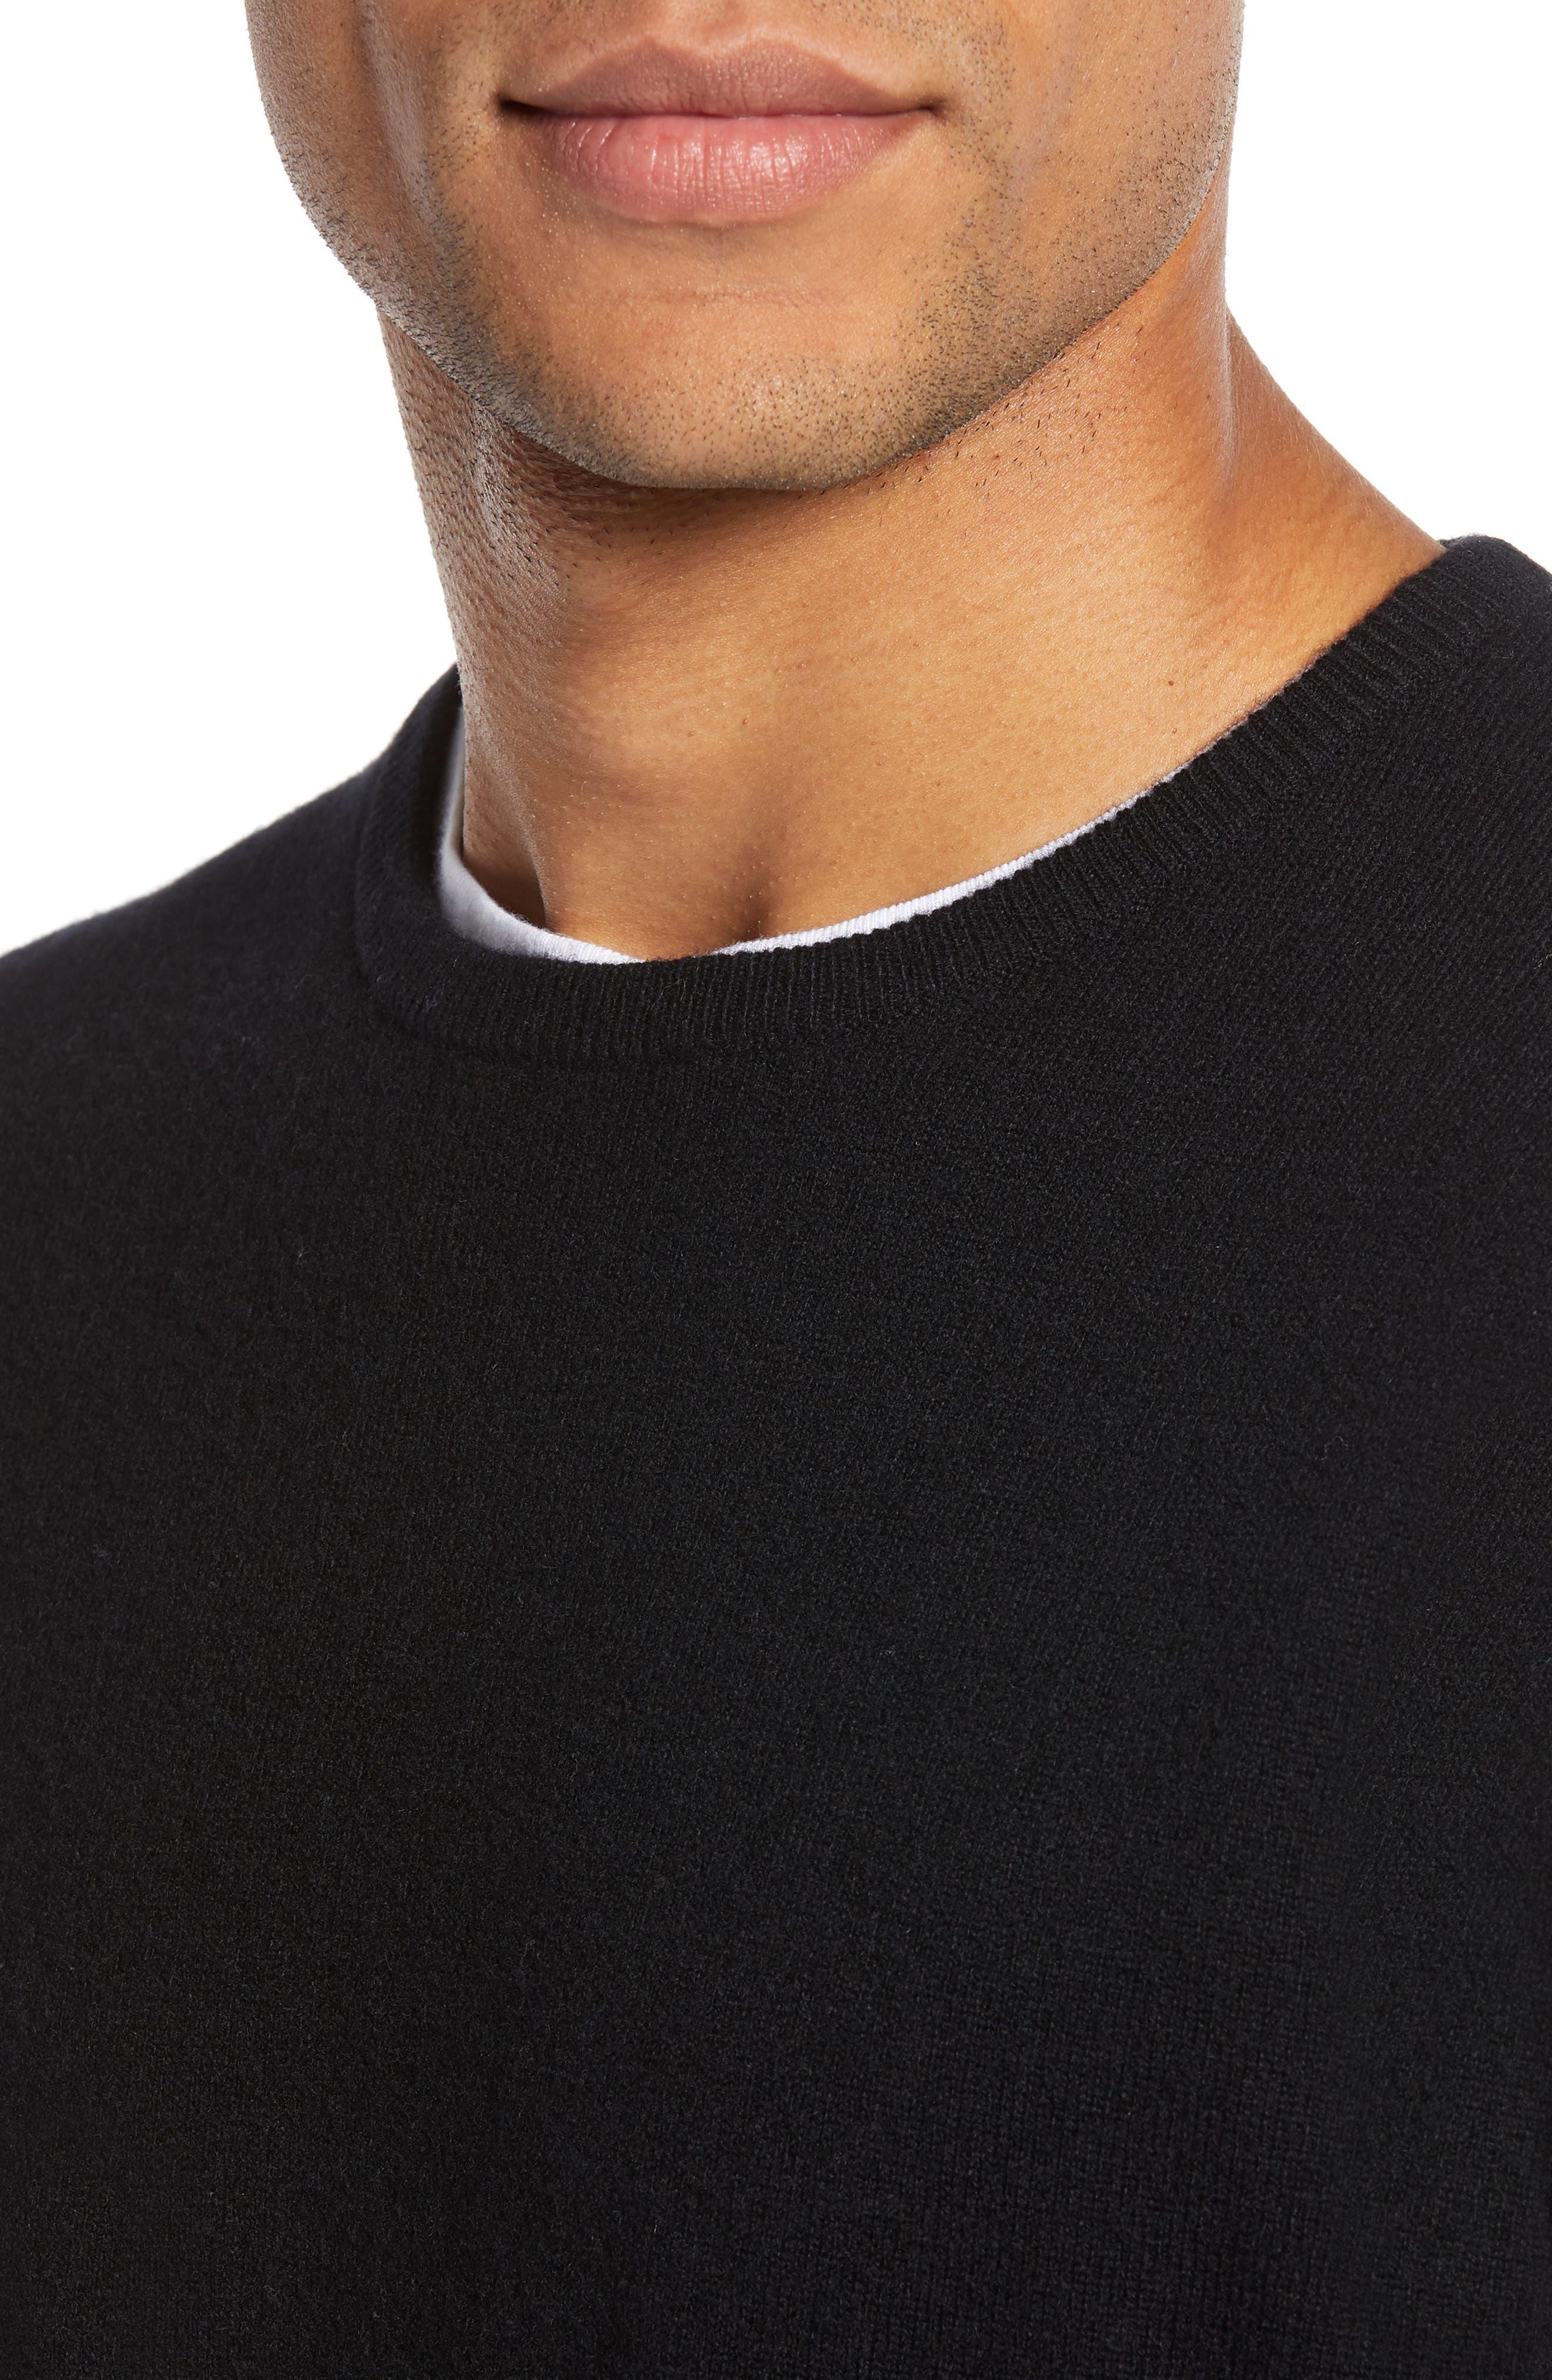 Regular Fit Wool & Cashmere Sweater,                             Alternate thumbnail 4, color,                             BLACK CAVIAR